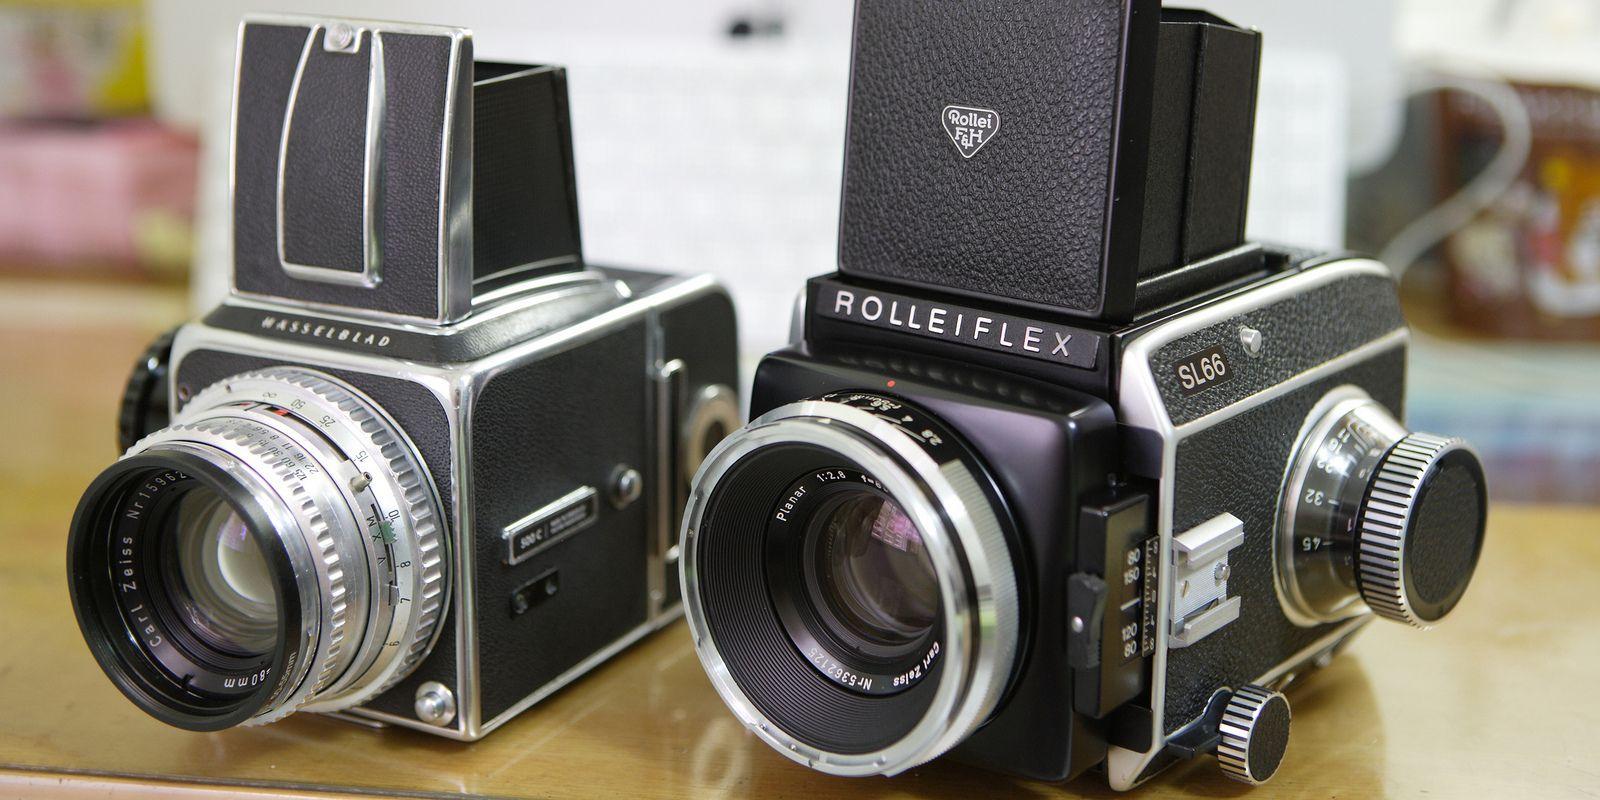 27f9c851984 Rolleiflex SL66 V.S Hasselblad 500C - 1